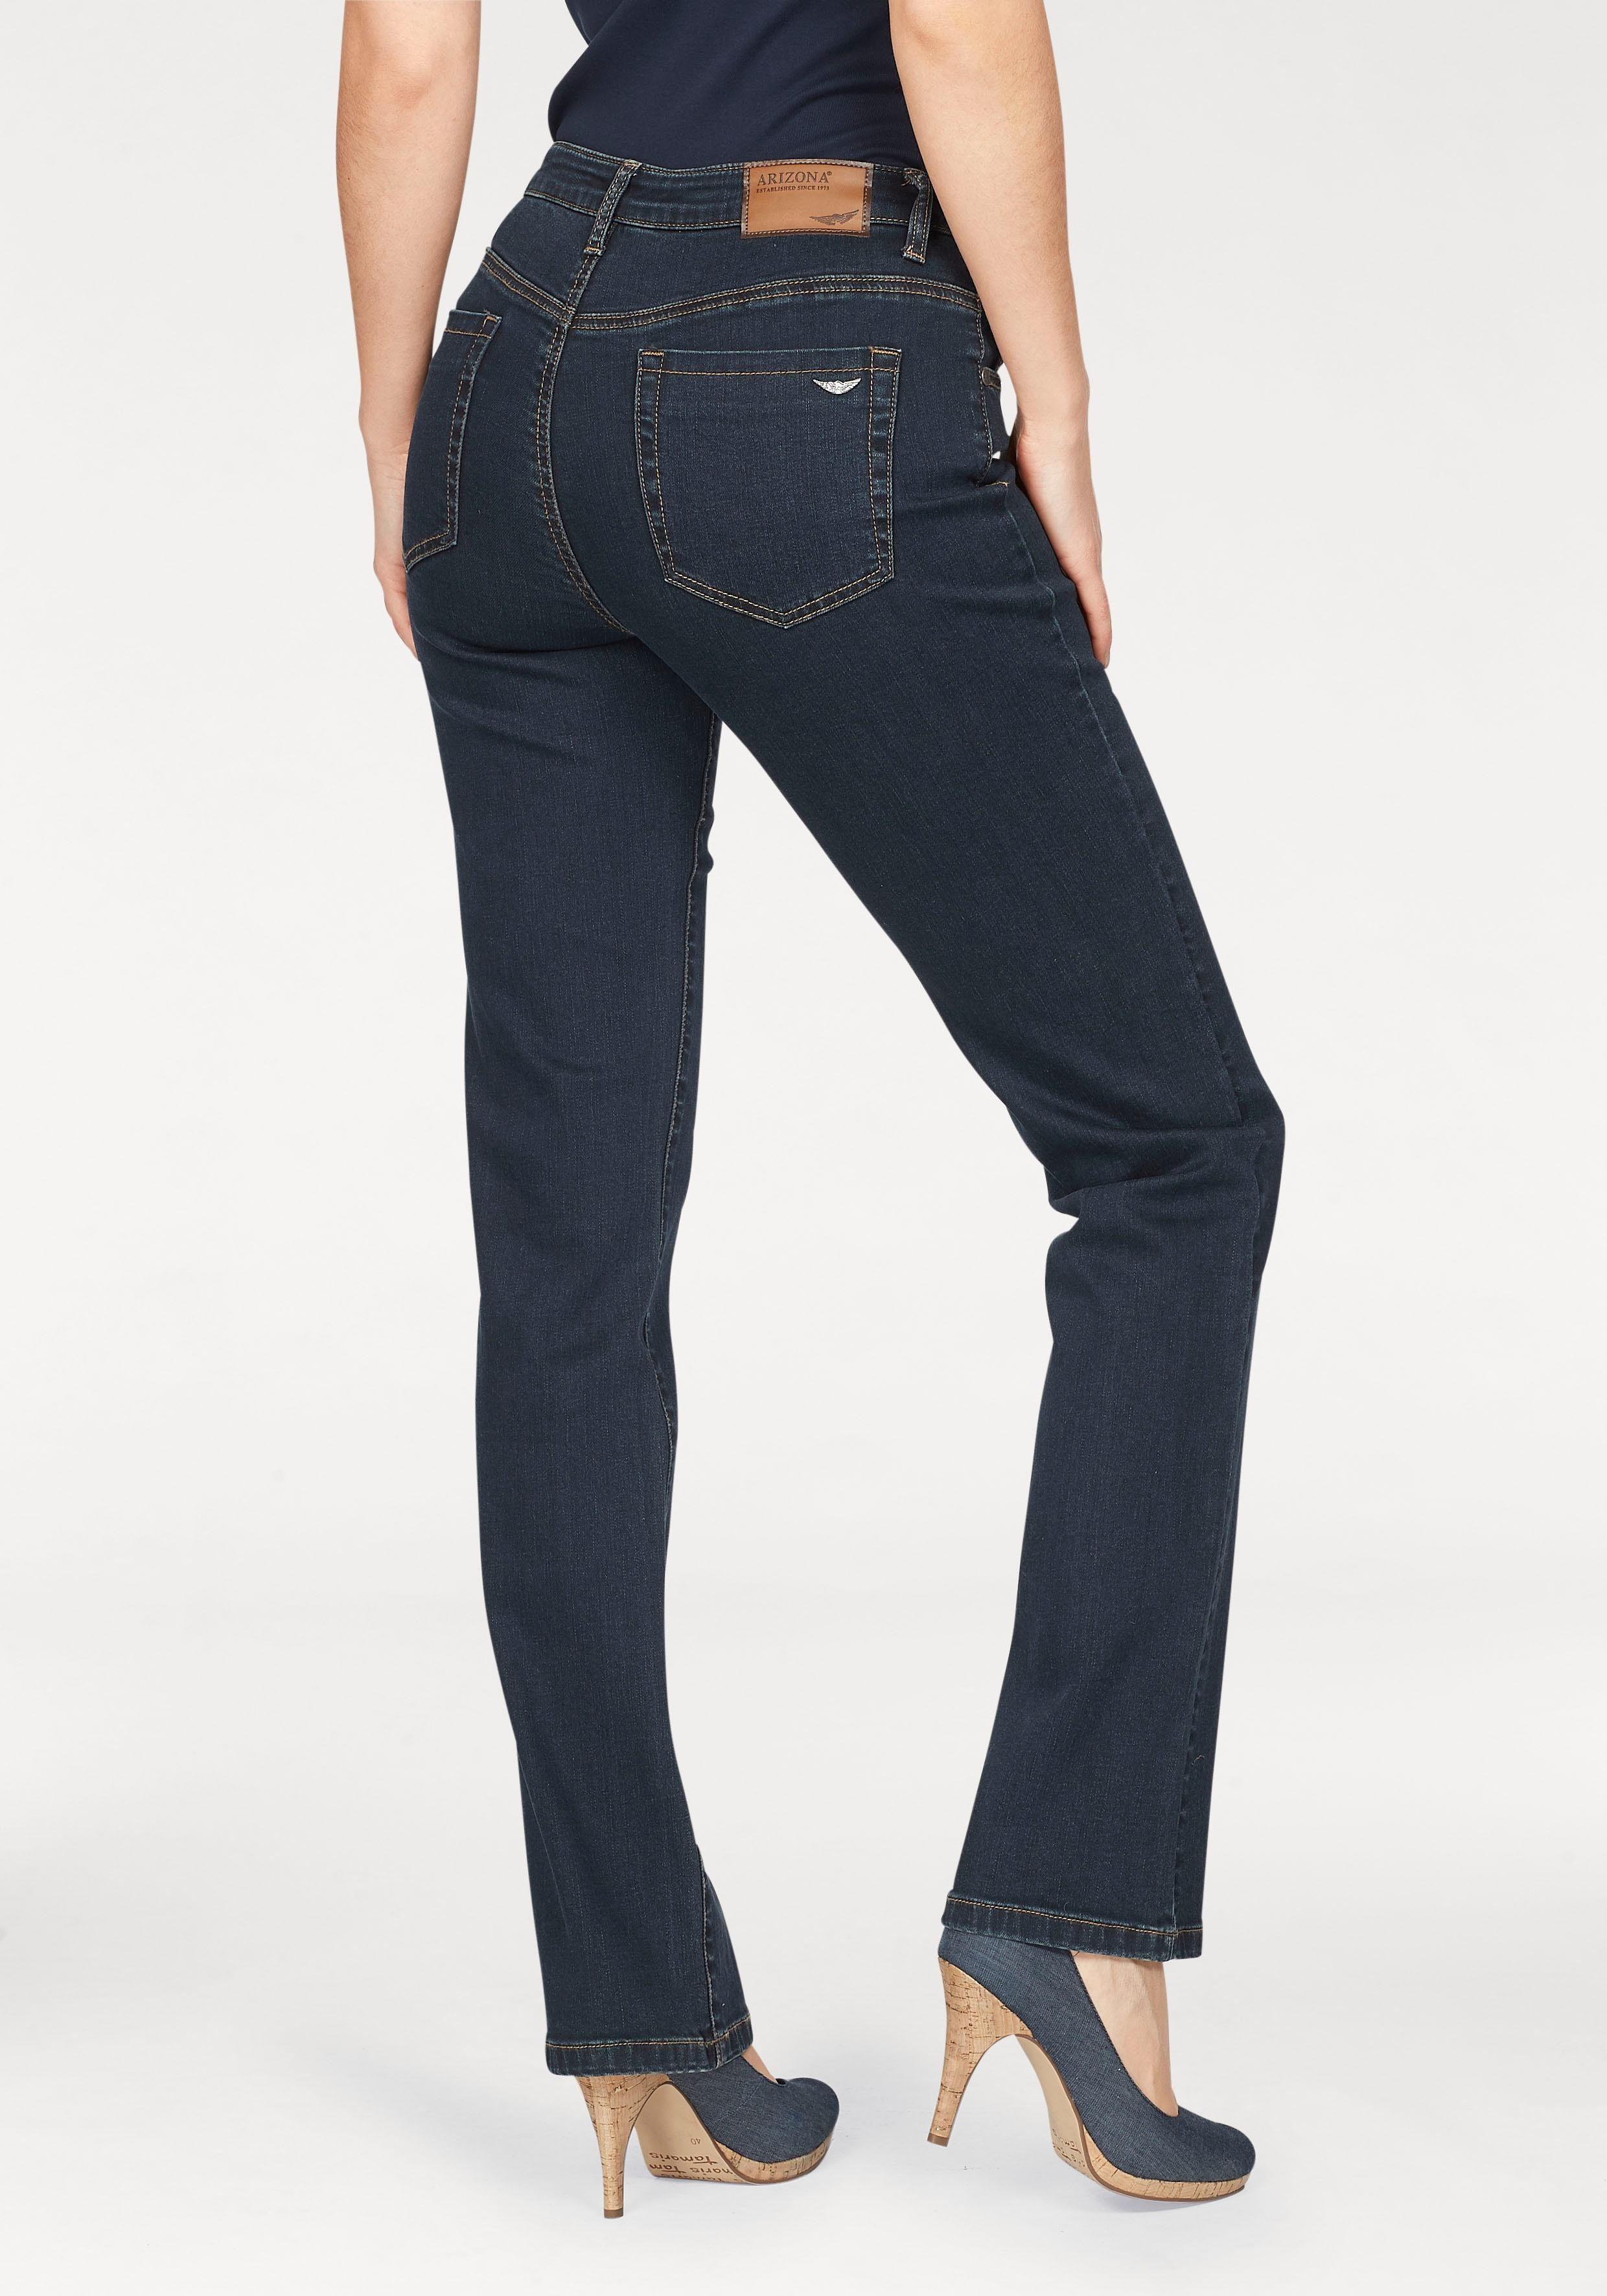 Arizona Gerade Jeans »Shaping« High Waist kaufen   OTTO